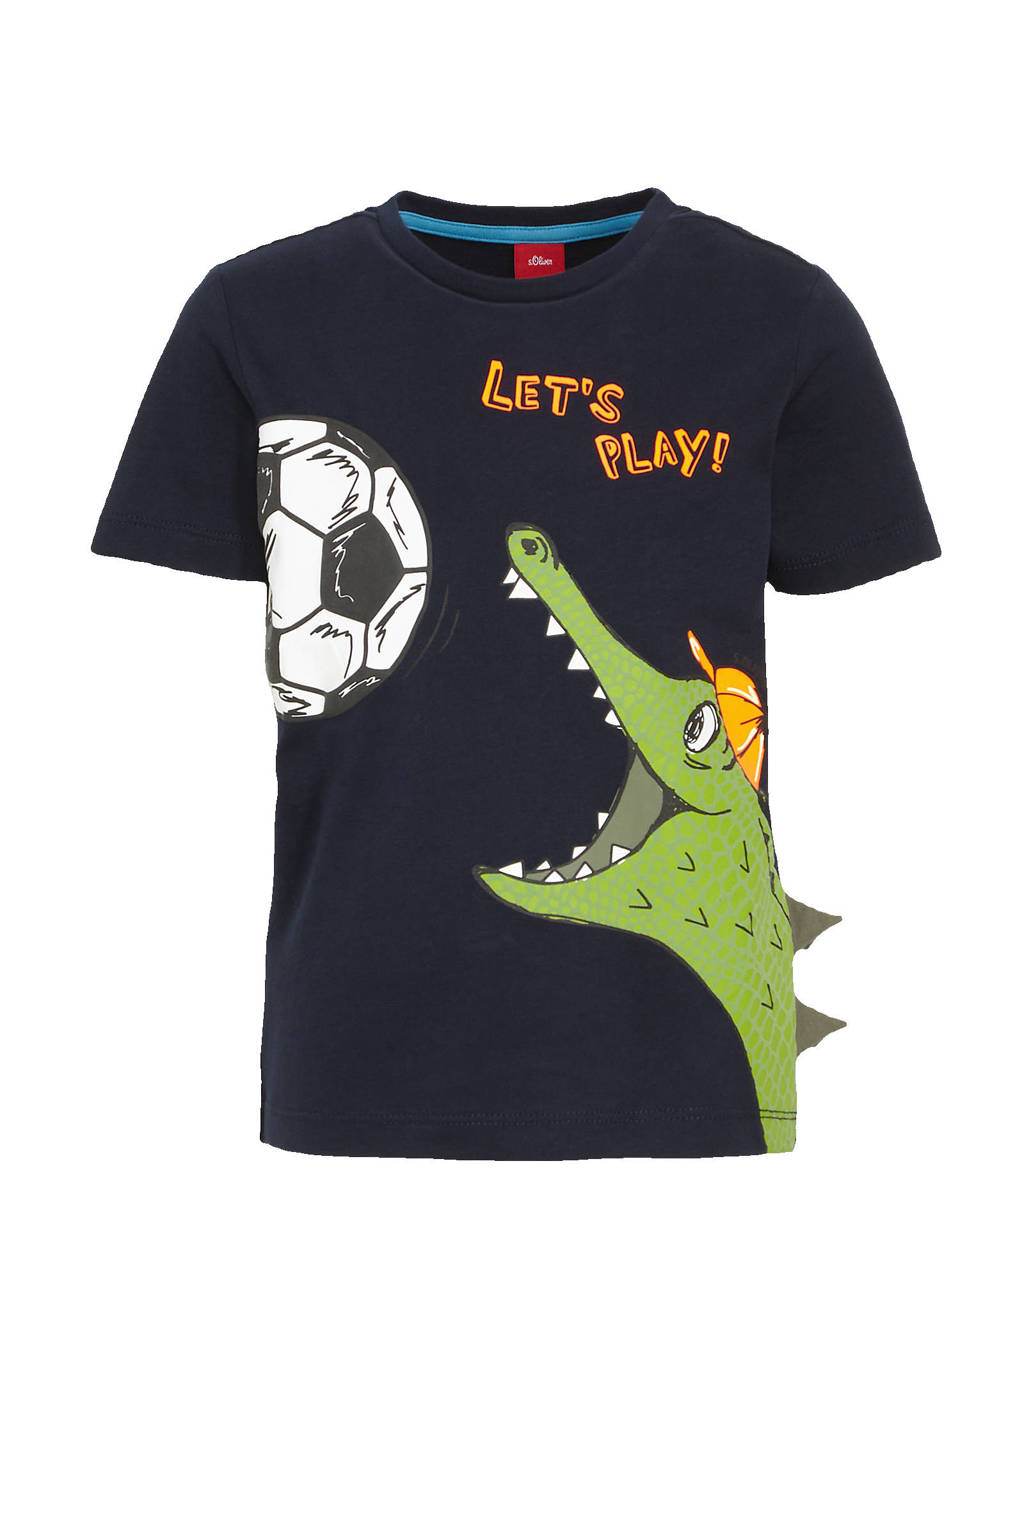 s.Oliver T-shirt met dierenprint donkerblauw/groen, Donkerblauw/groen